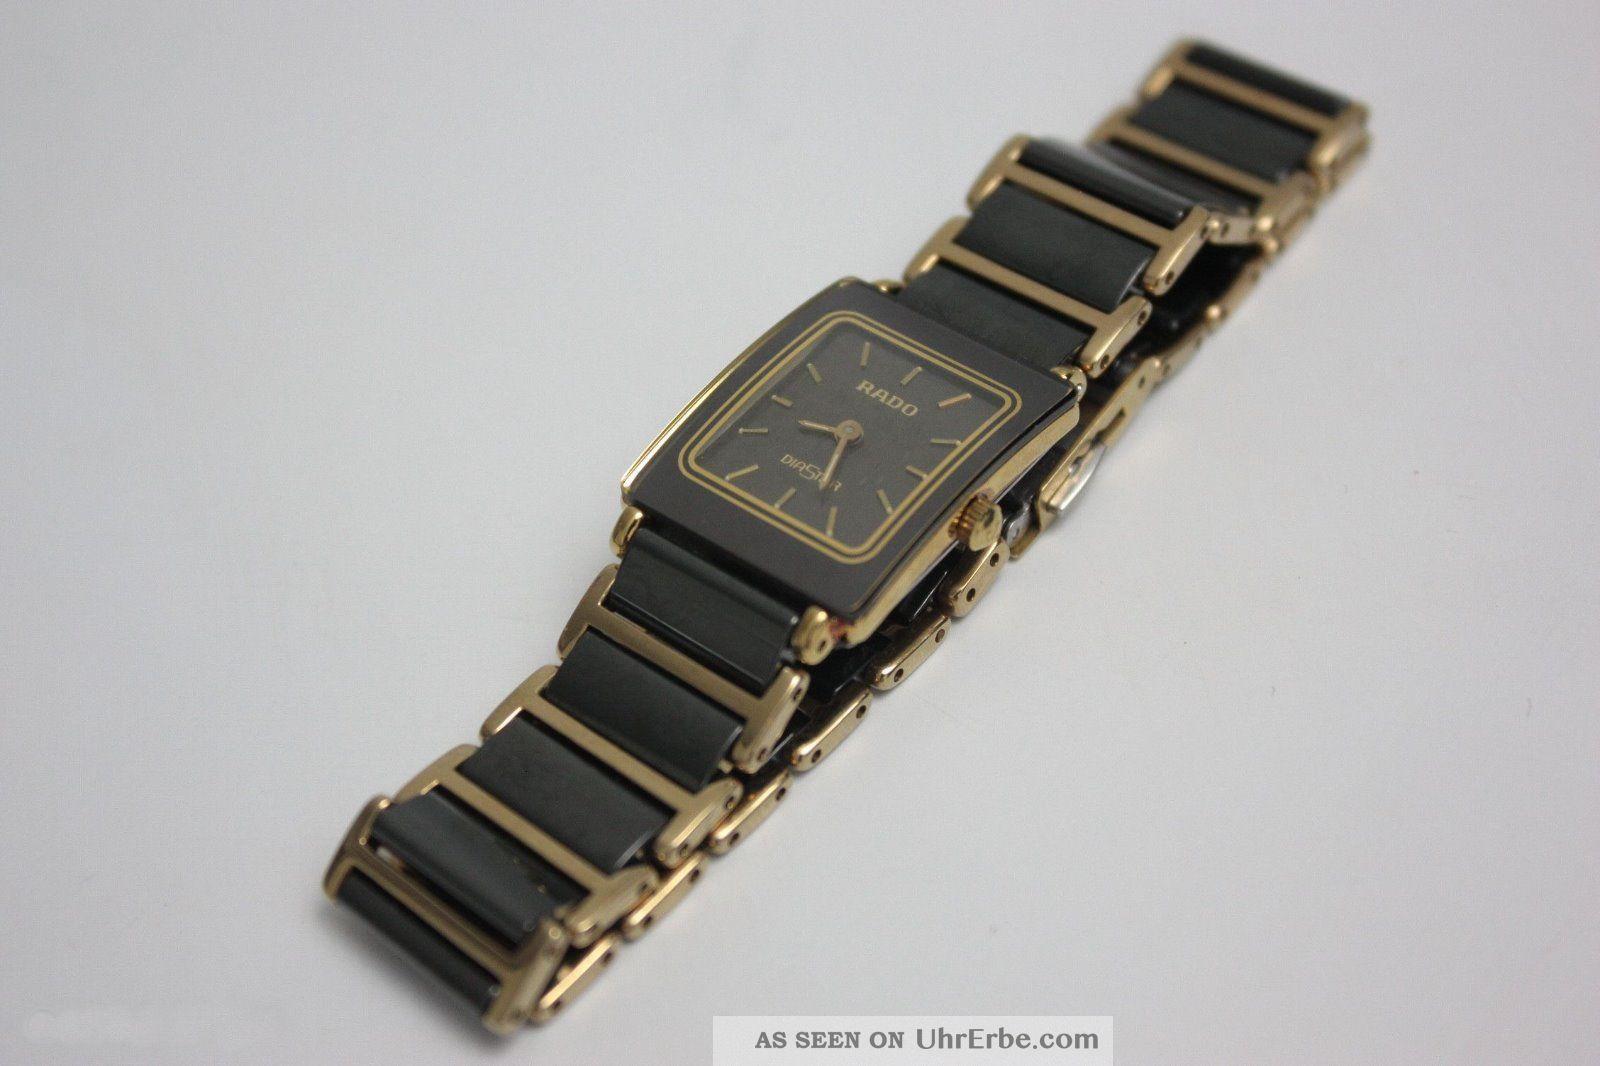 Rado Damenuhr Sportlich Elegant - Absolut Neuwertig Armbanduhren Bild